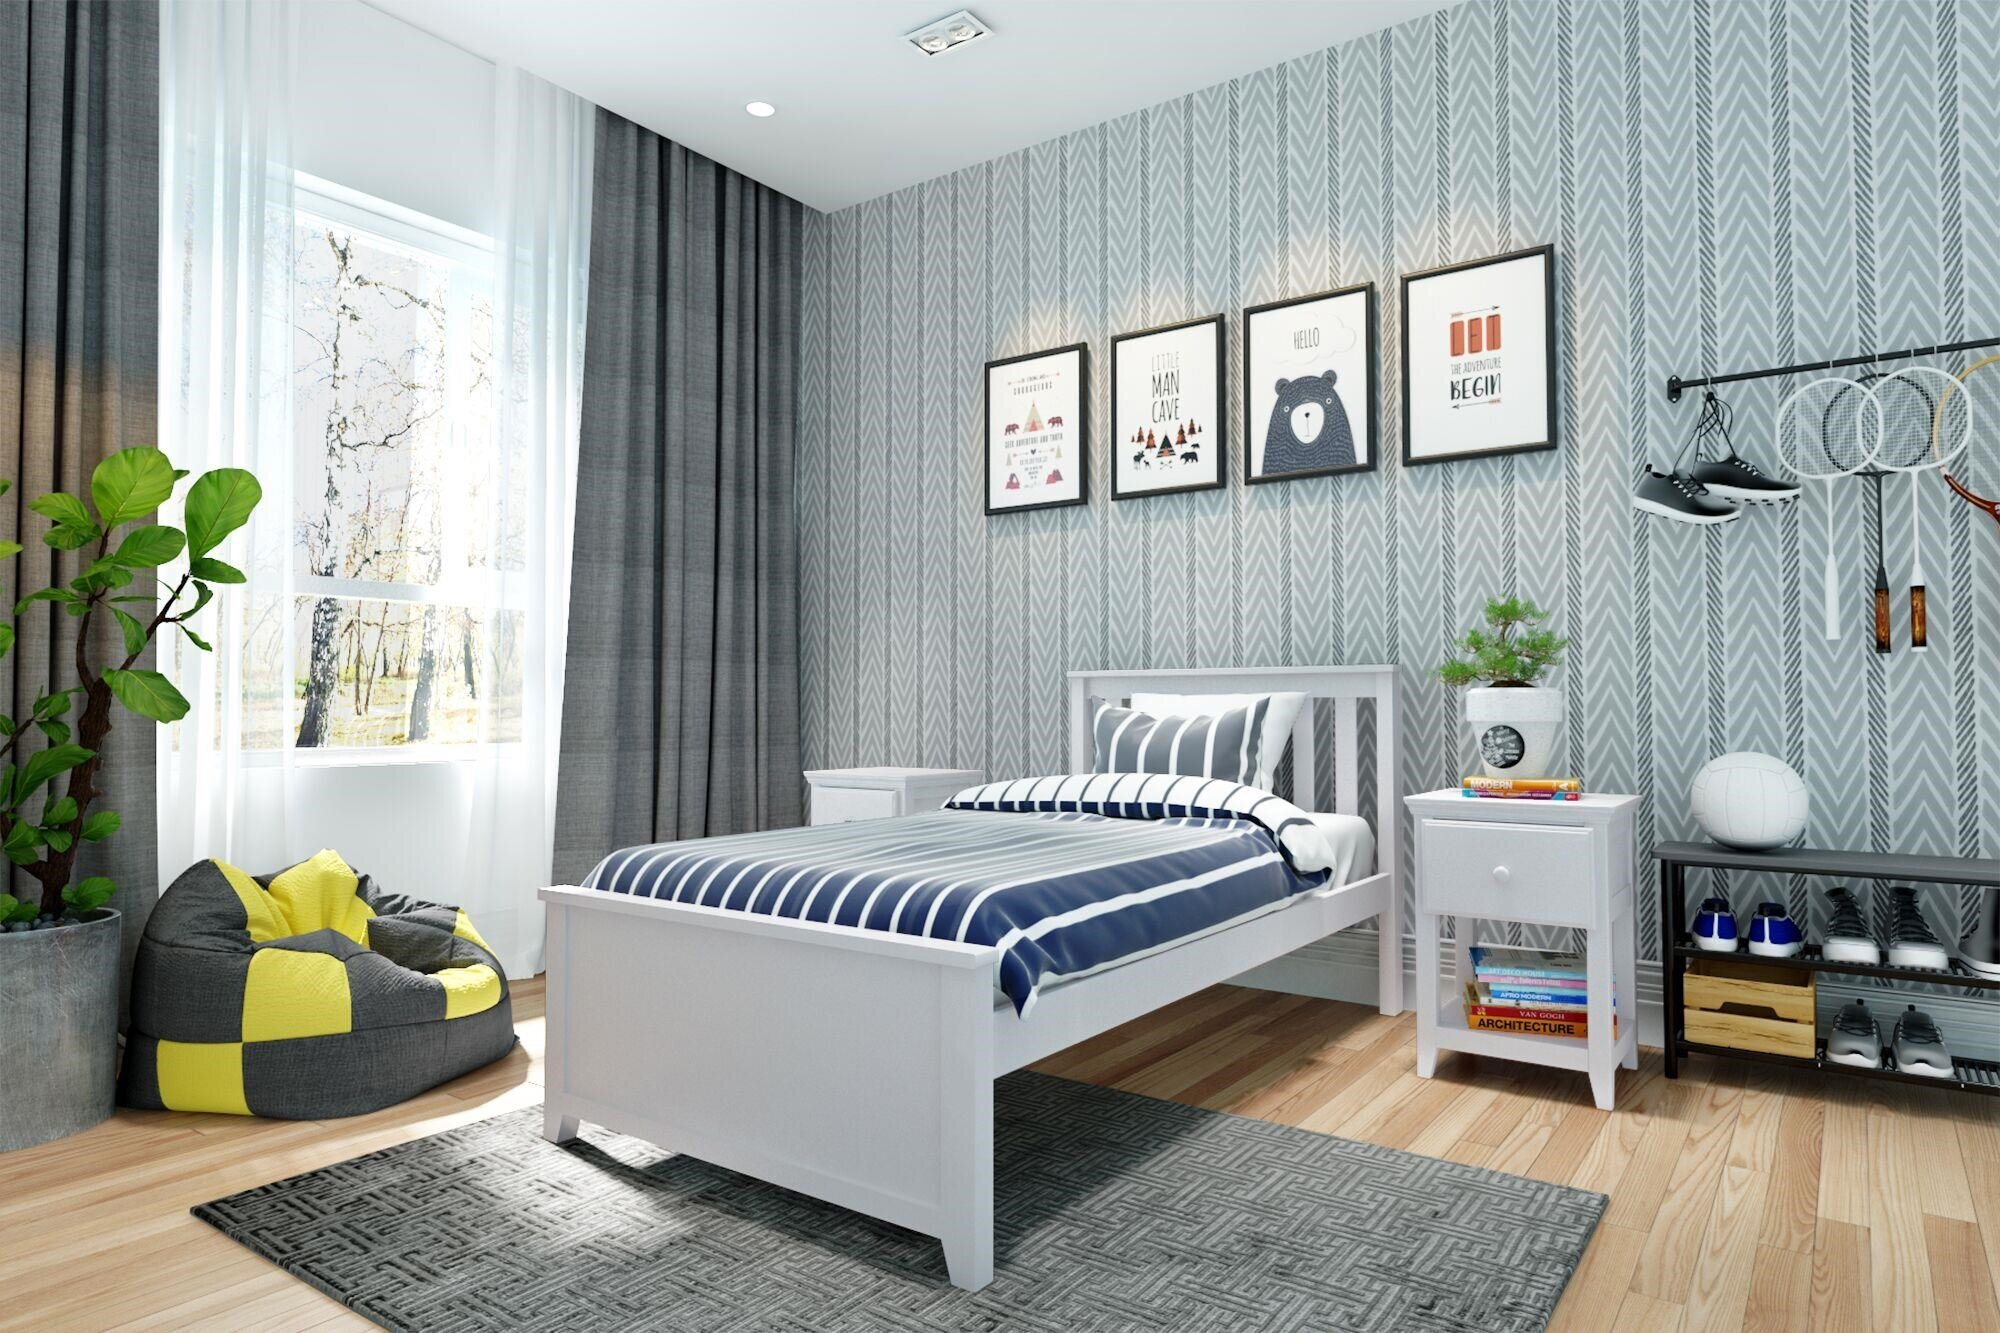 Customize Kids Bedroom Furniture Belfort Buzz Furniture And Design Tips